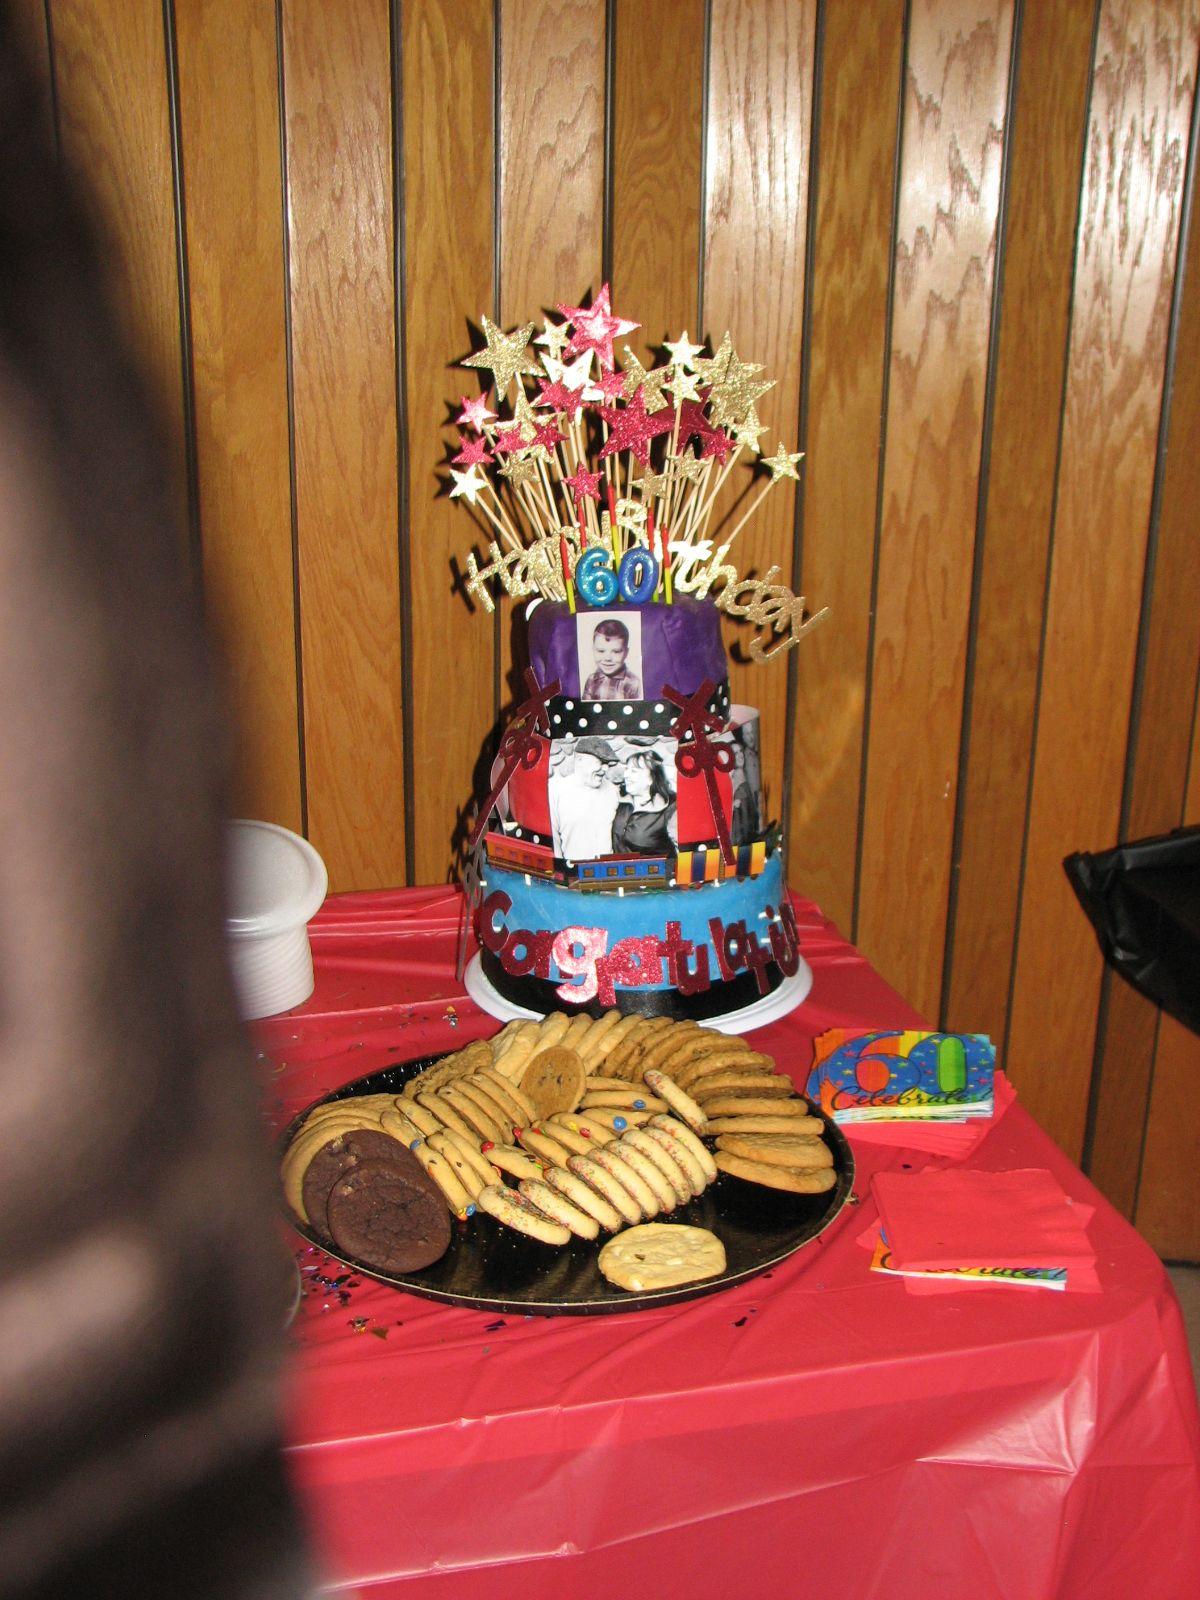 dads cake!